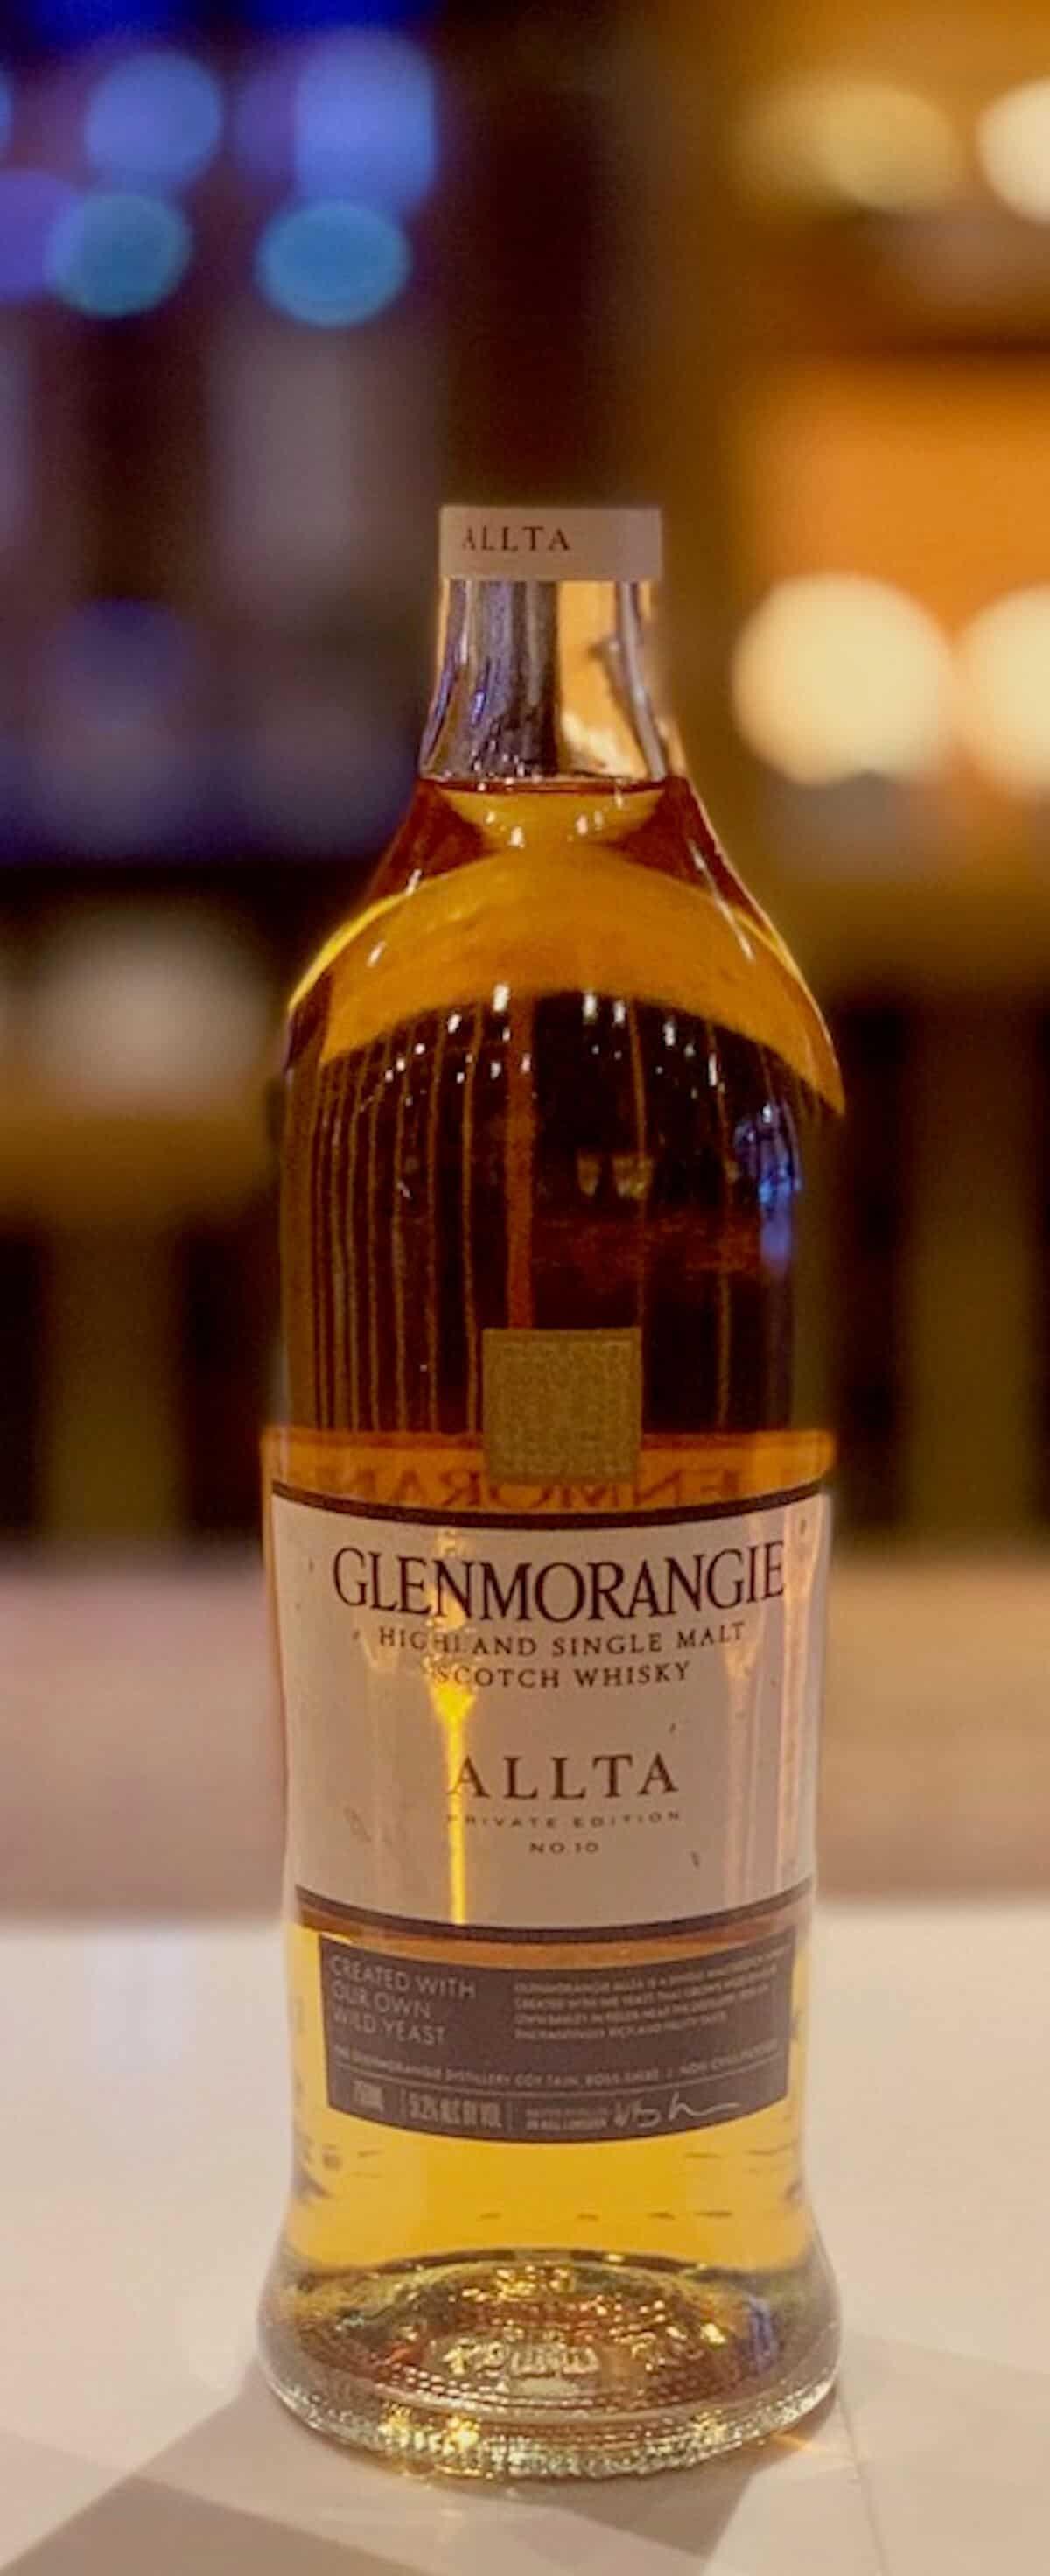 Glenmorangie Allta in bottle